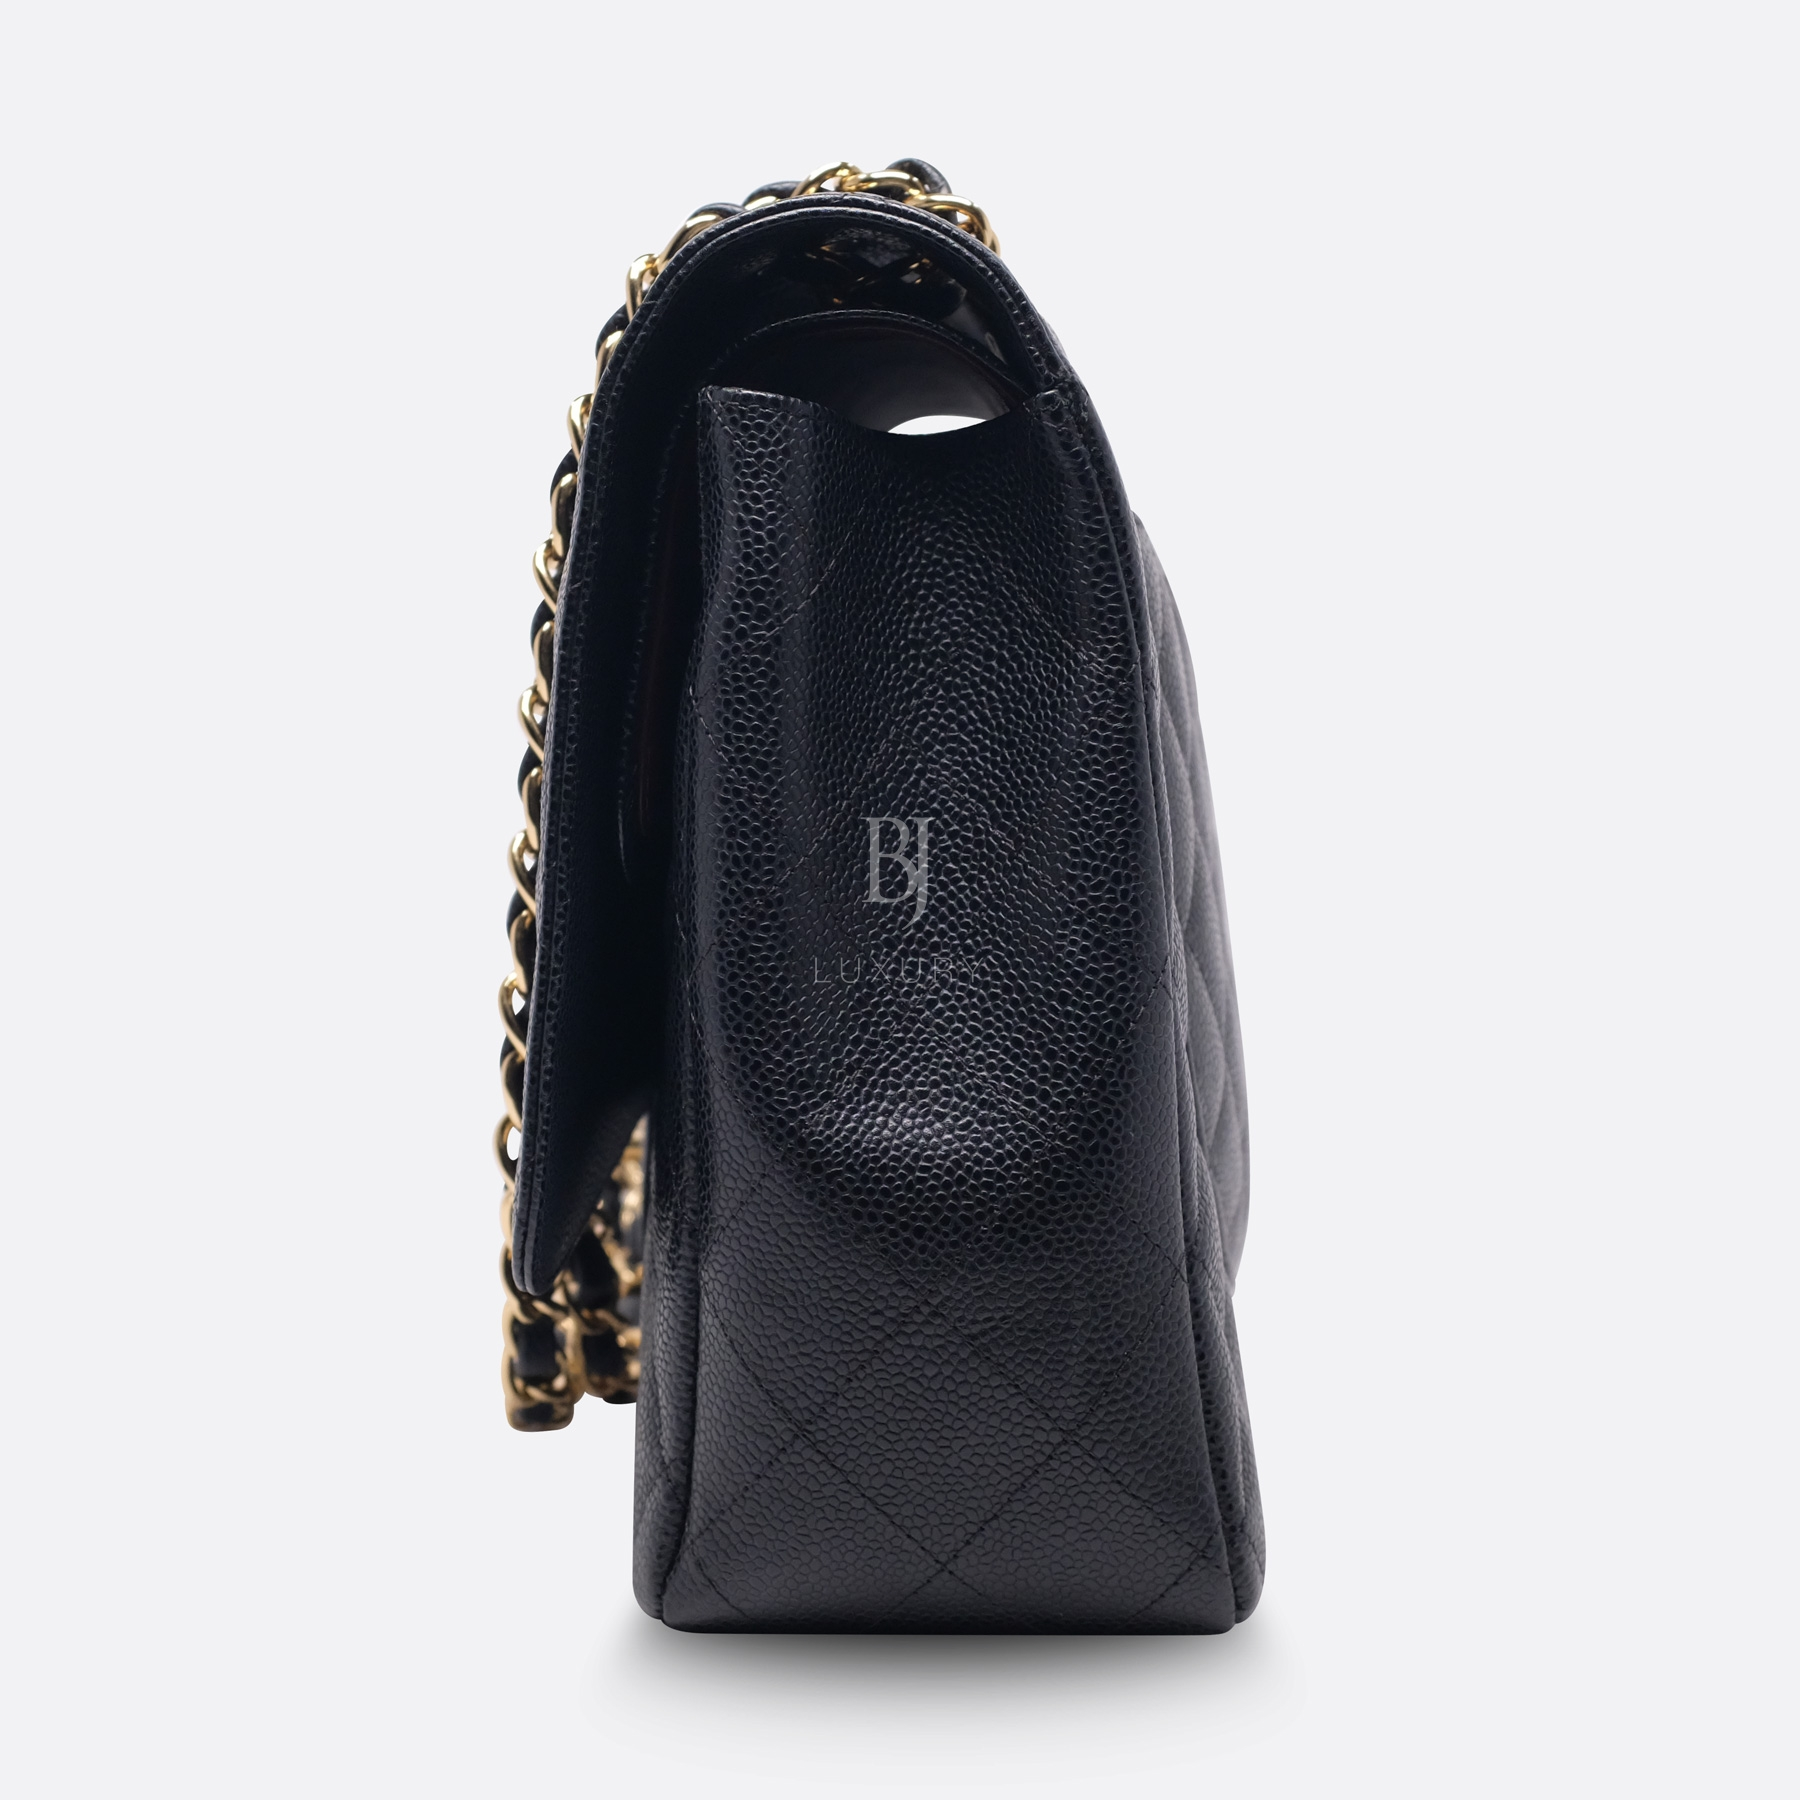 Chanel Classic Handbag Caviar Maxi Black BJ Luxury 6.jpg